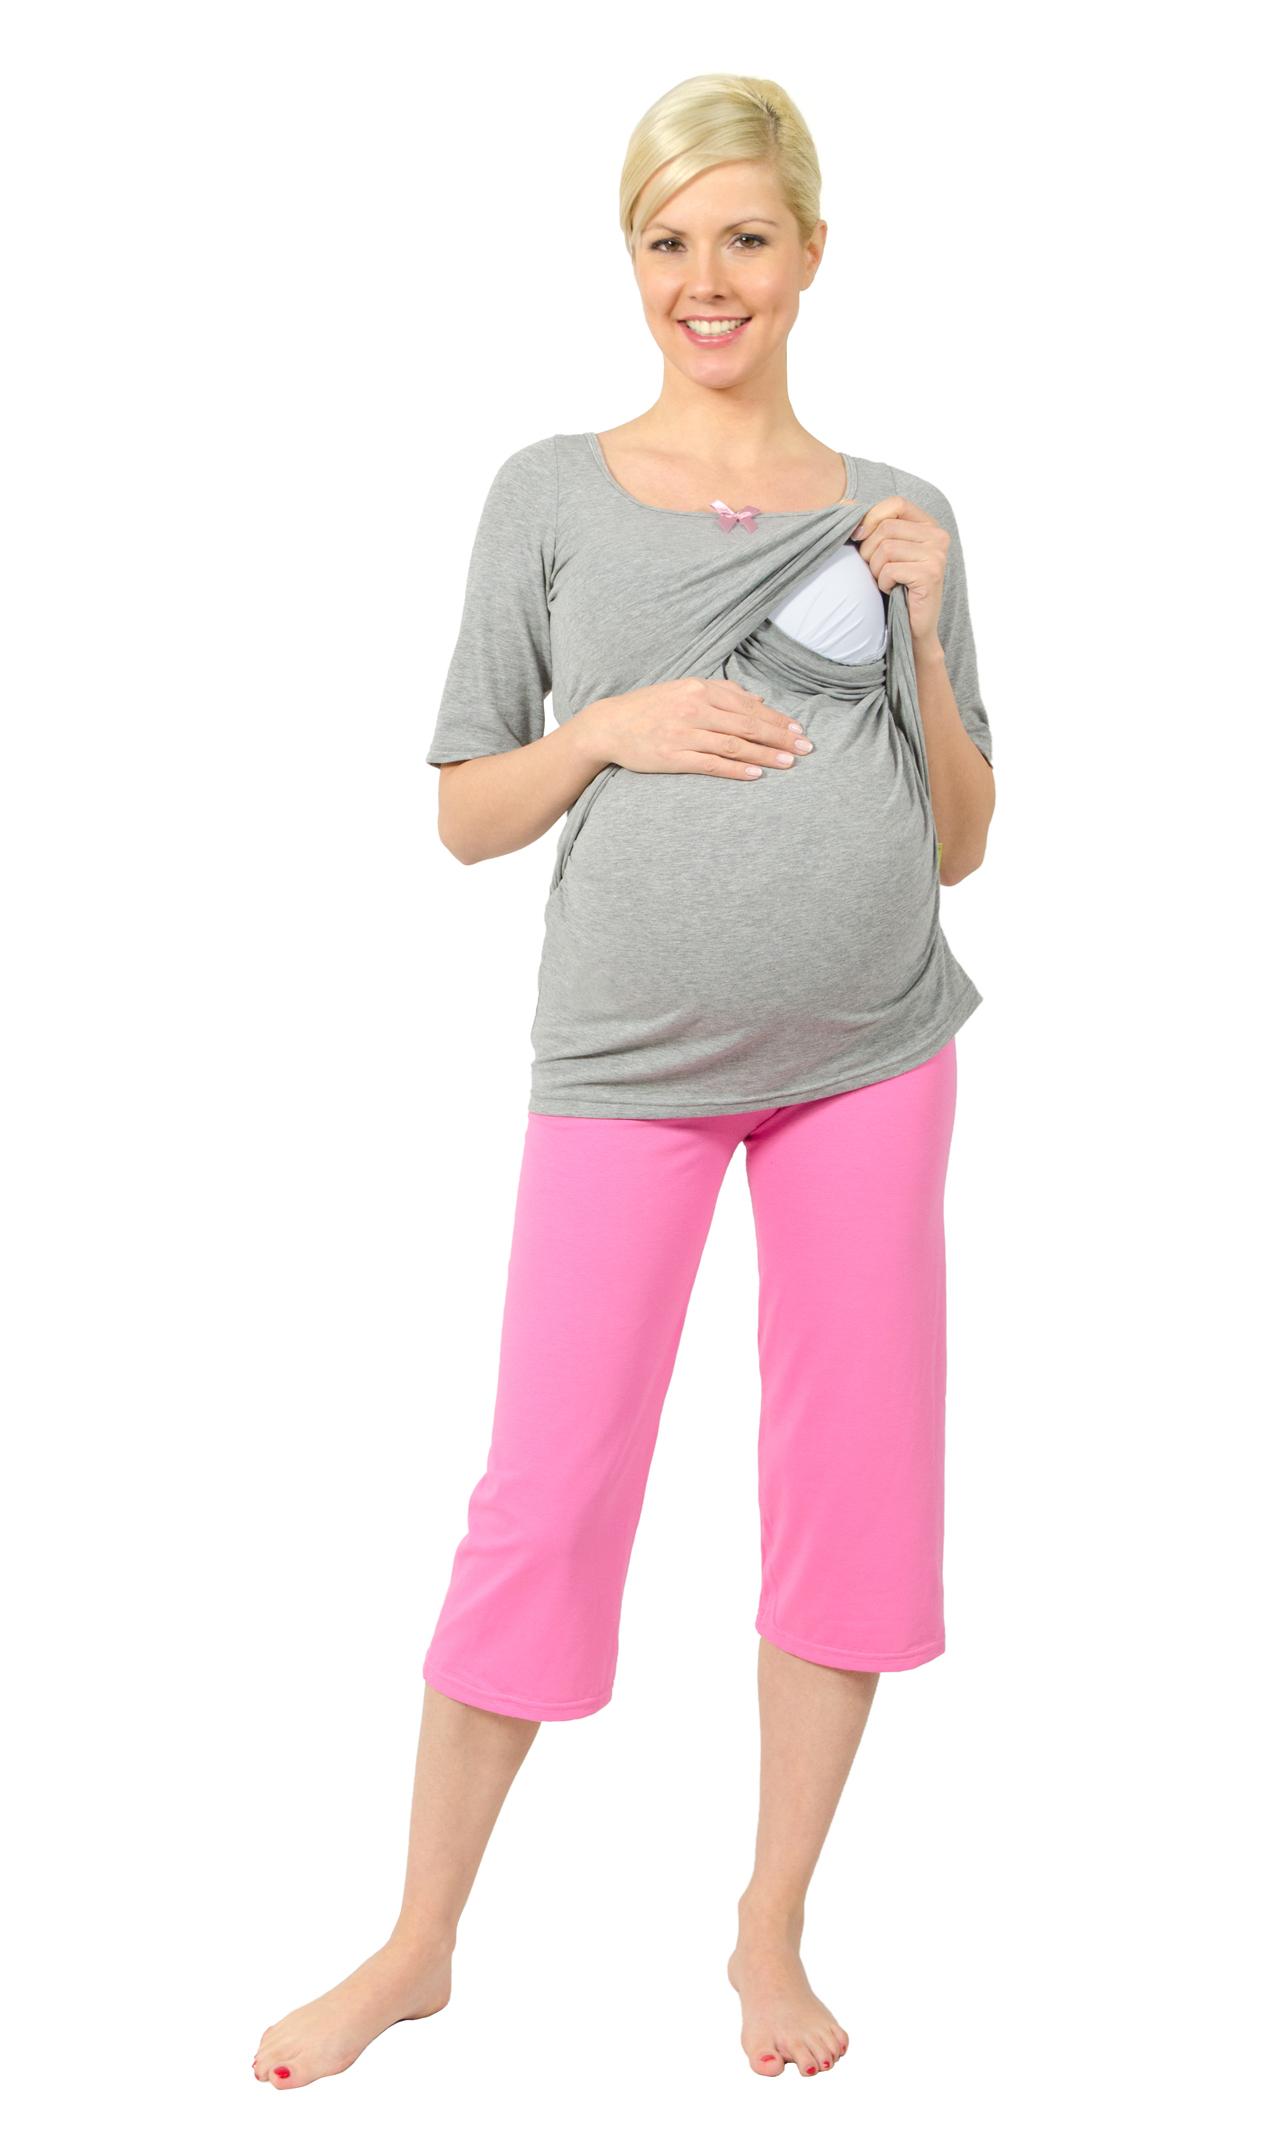 schwangerschafts pyjama stilltop still pyjama still nachthemd nachthemd stillen ebay. Black Bedroom Furniture Sets. Home Design Ideas